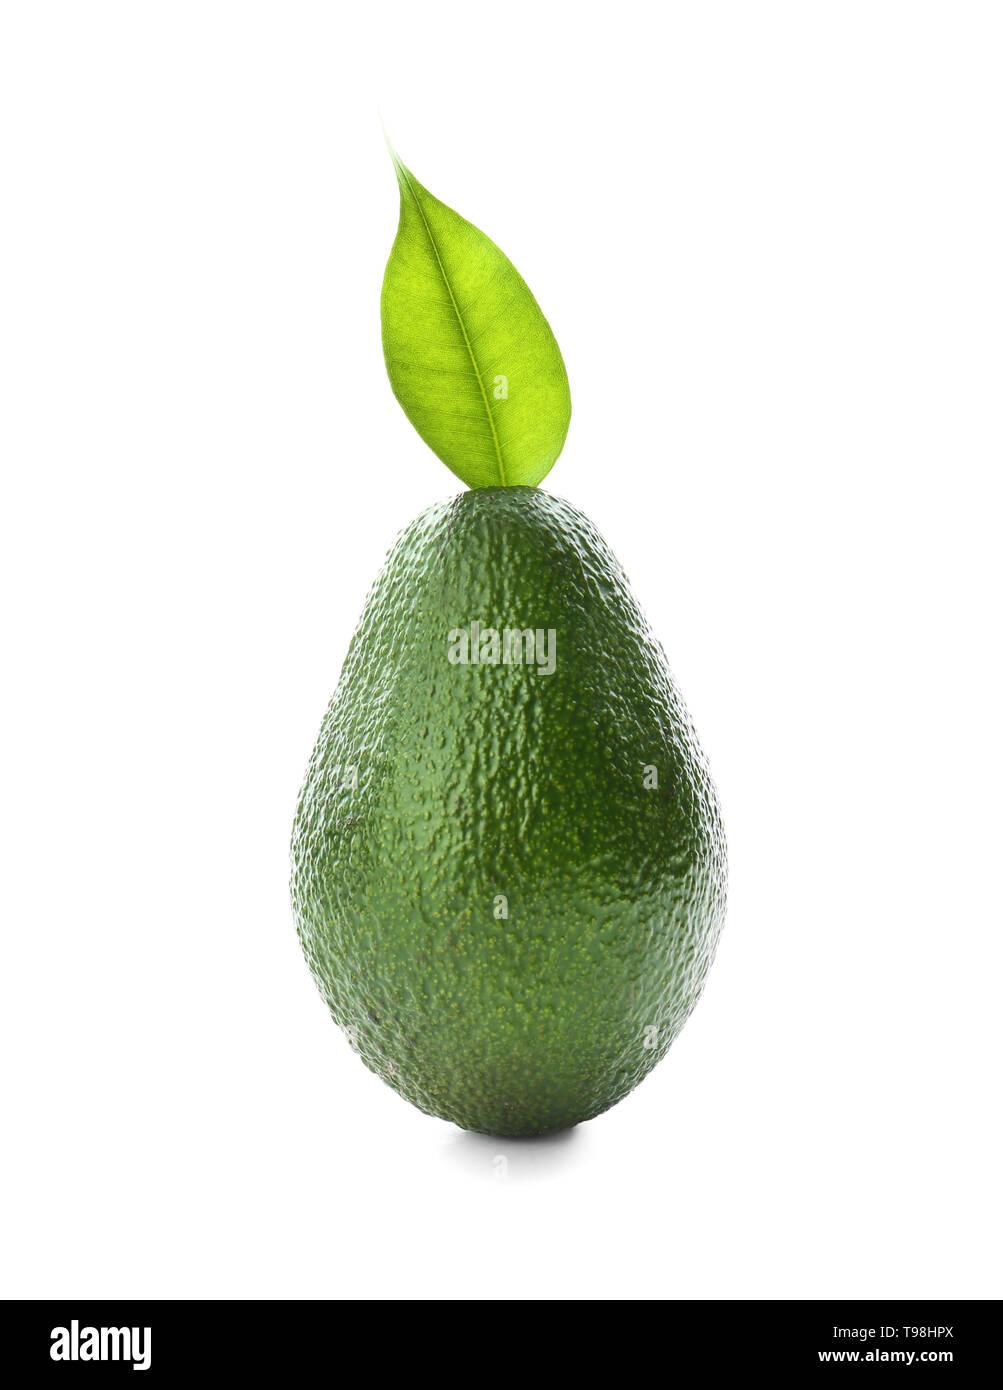 Ripe avocado on white background - Stock Image